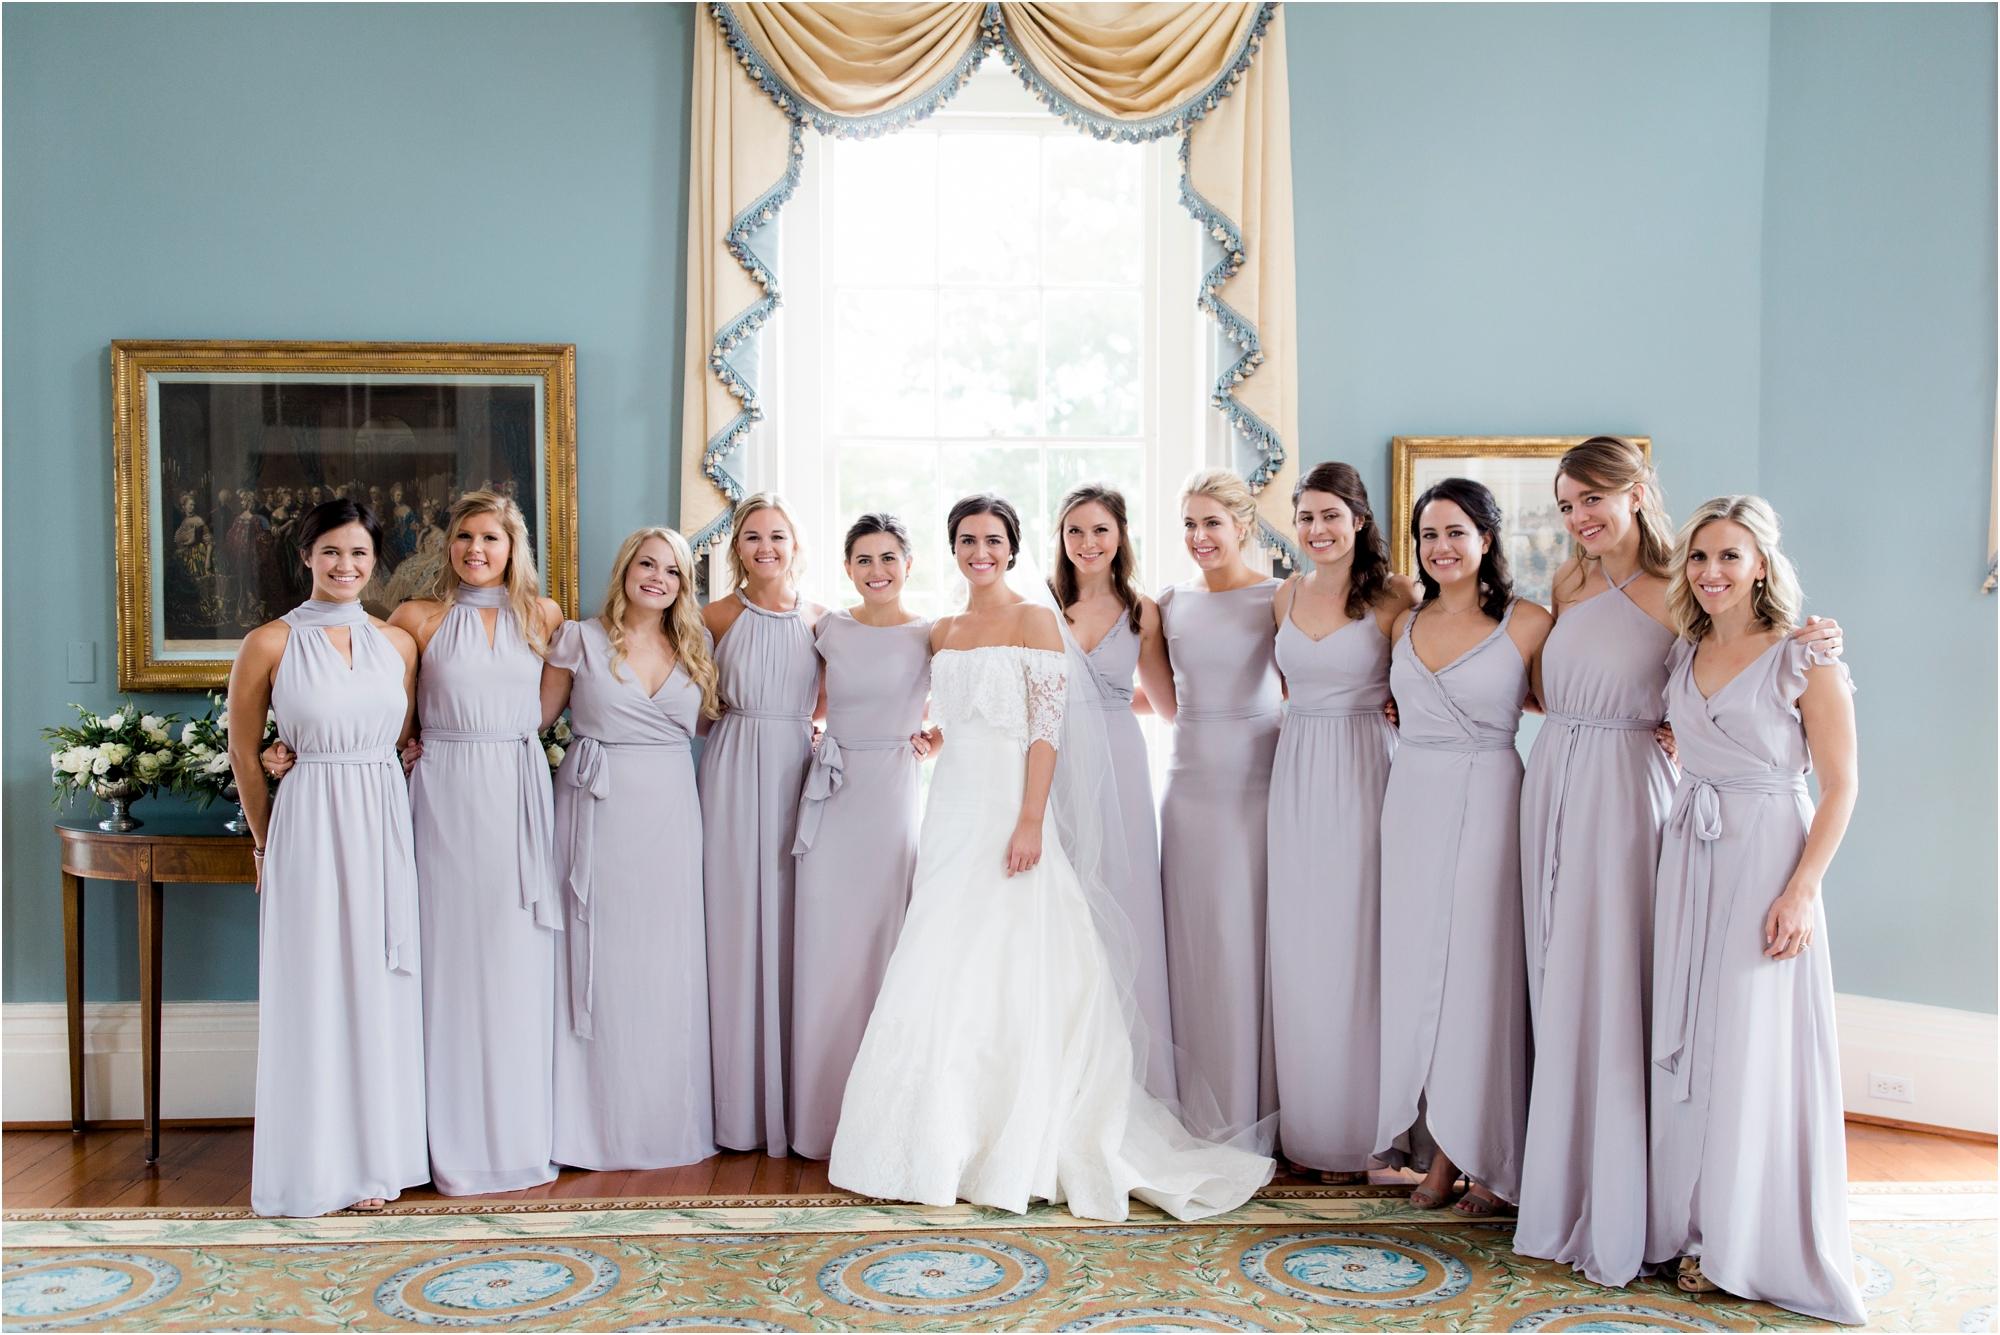 claire-thomas-farmington-country-club-charlottesville-virginia-wedding-photos_0009.jpg